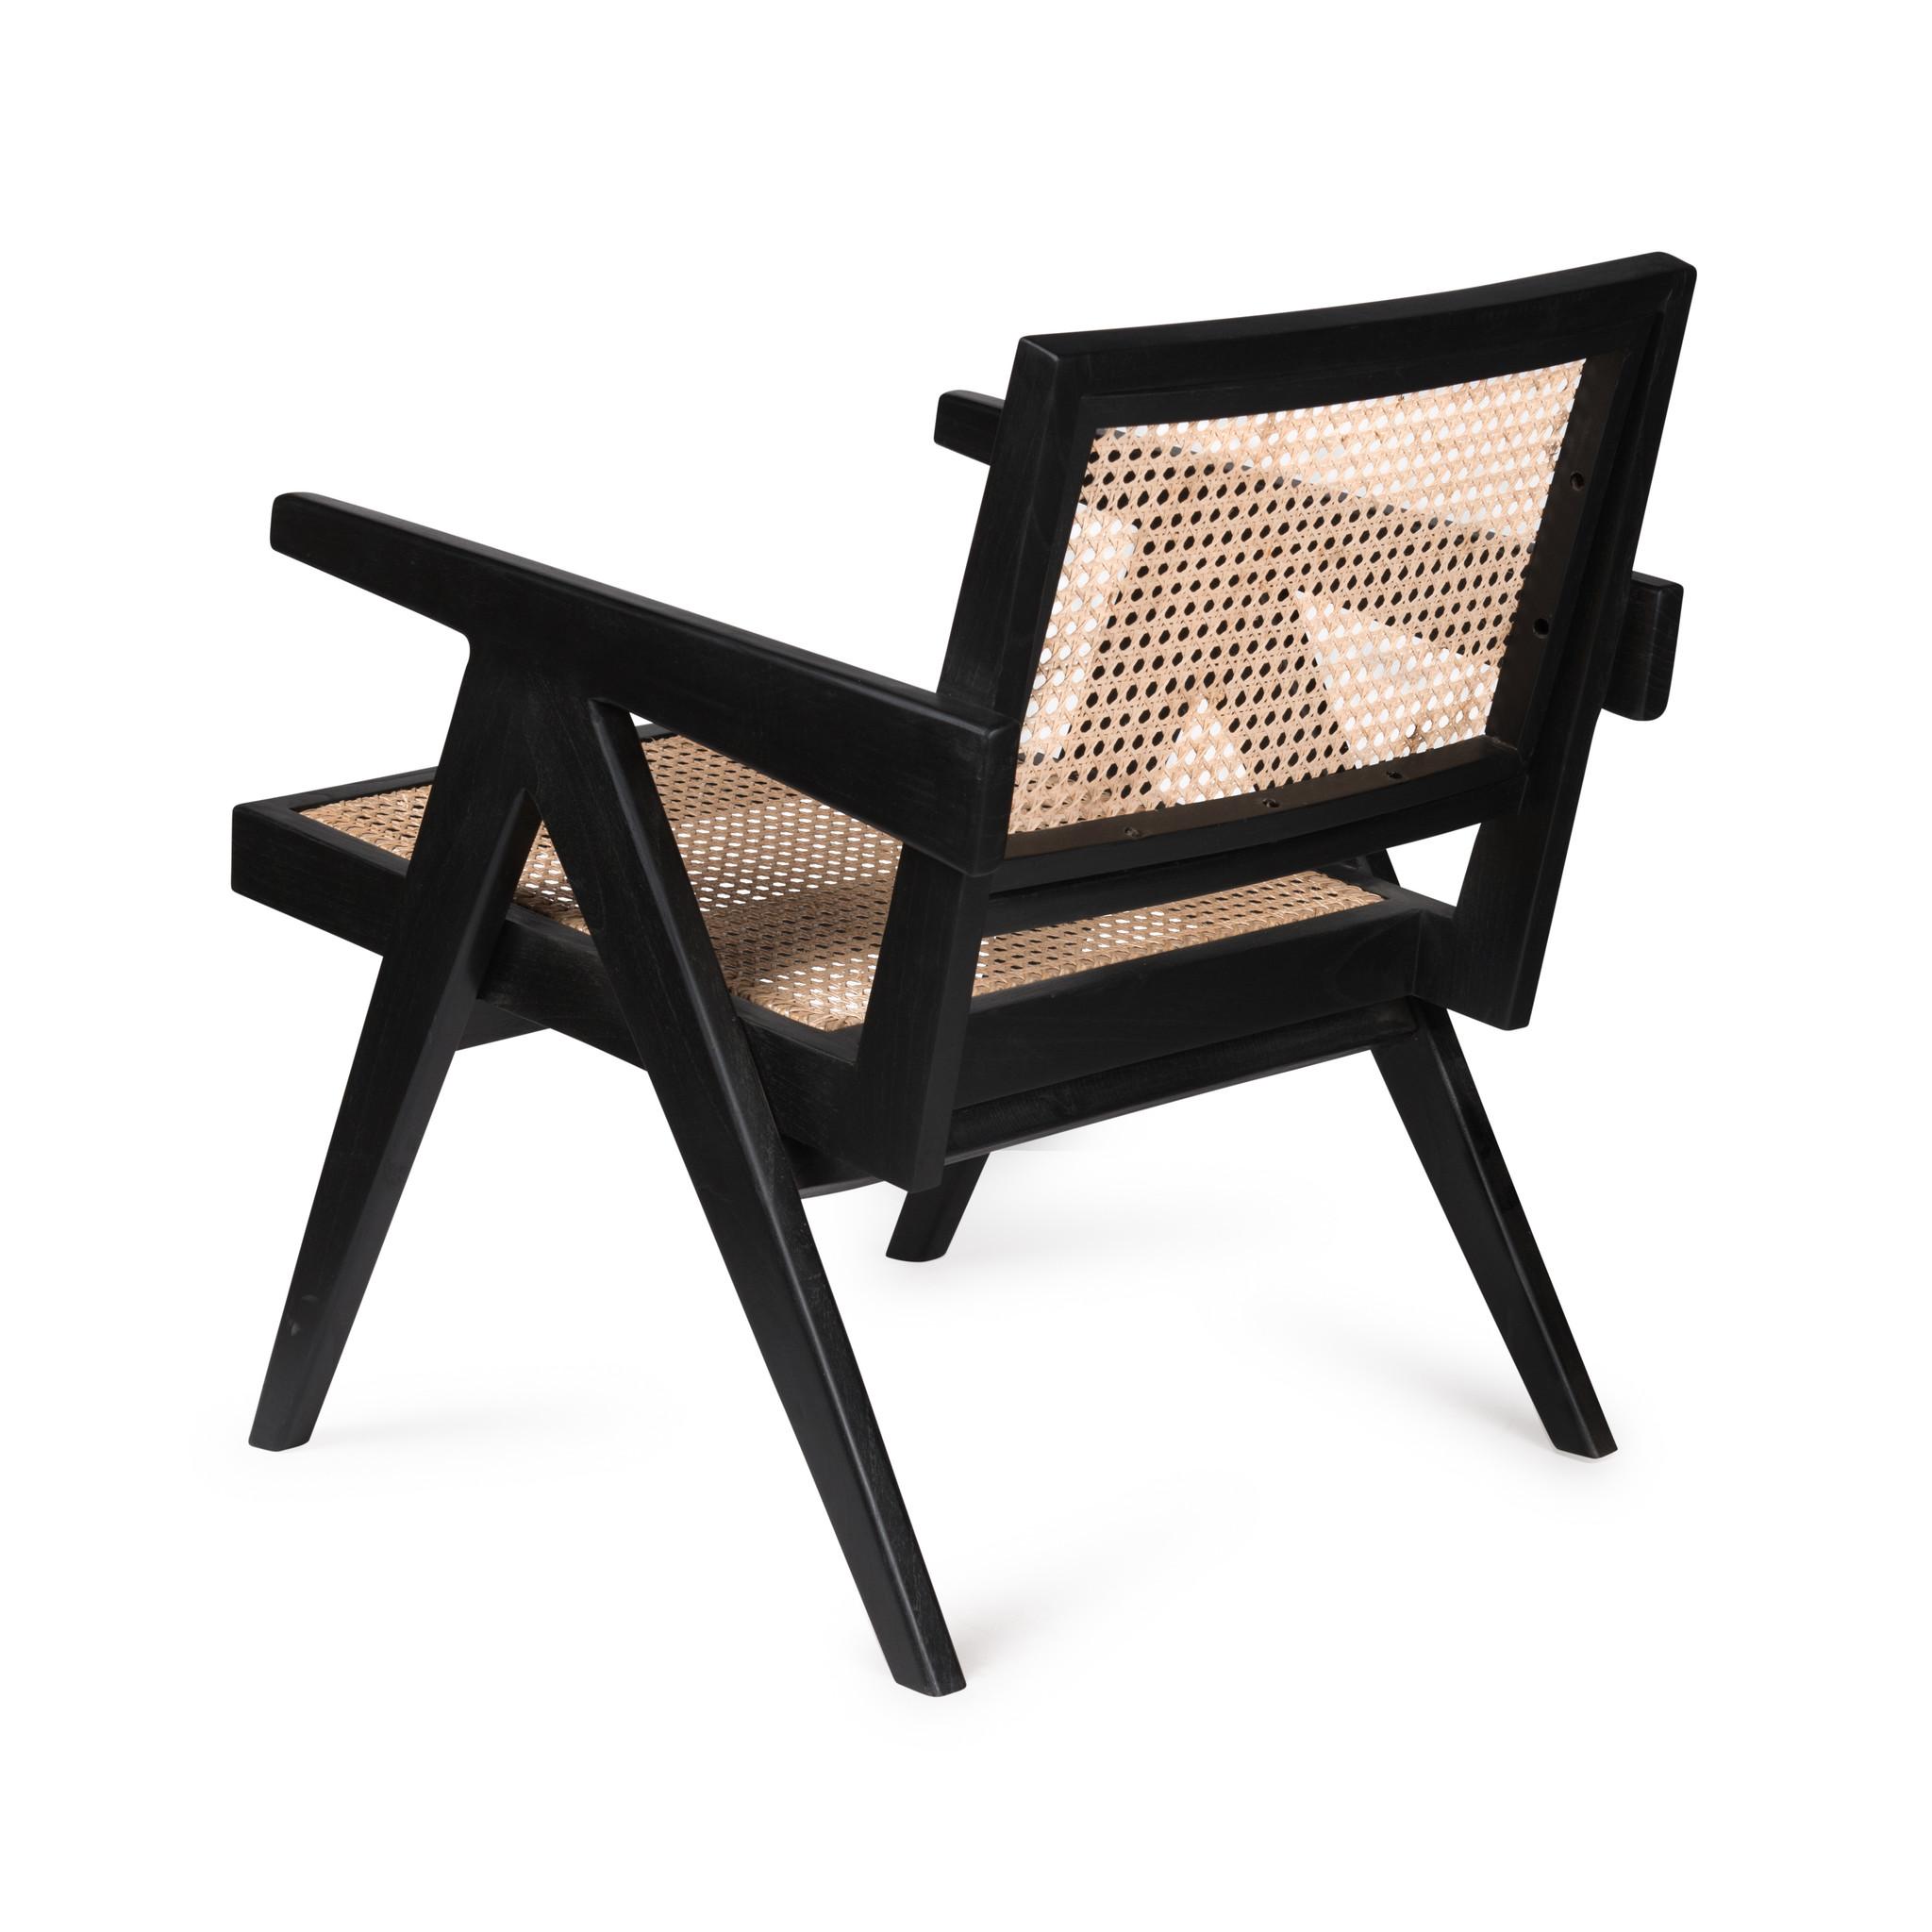 Easy Lounge Chair - Charcoal Black High Gloss-4